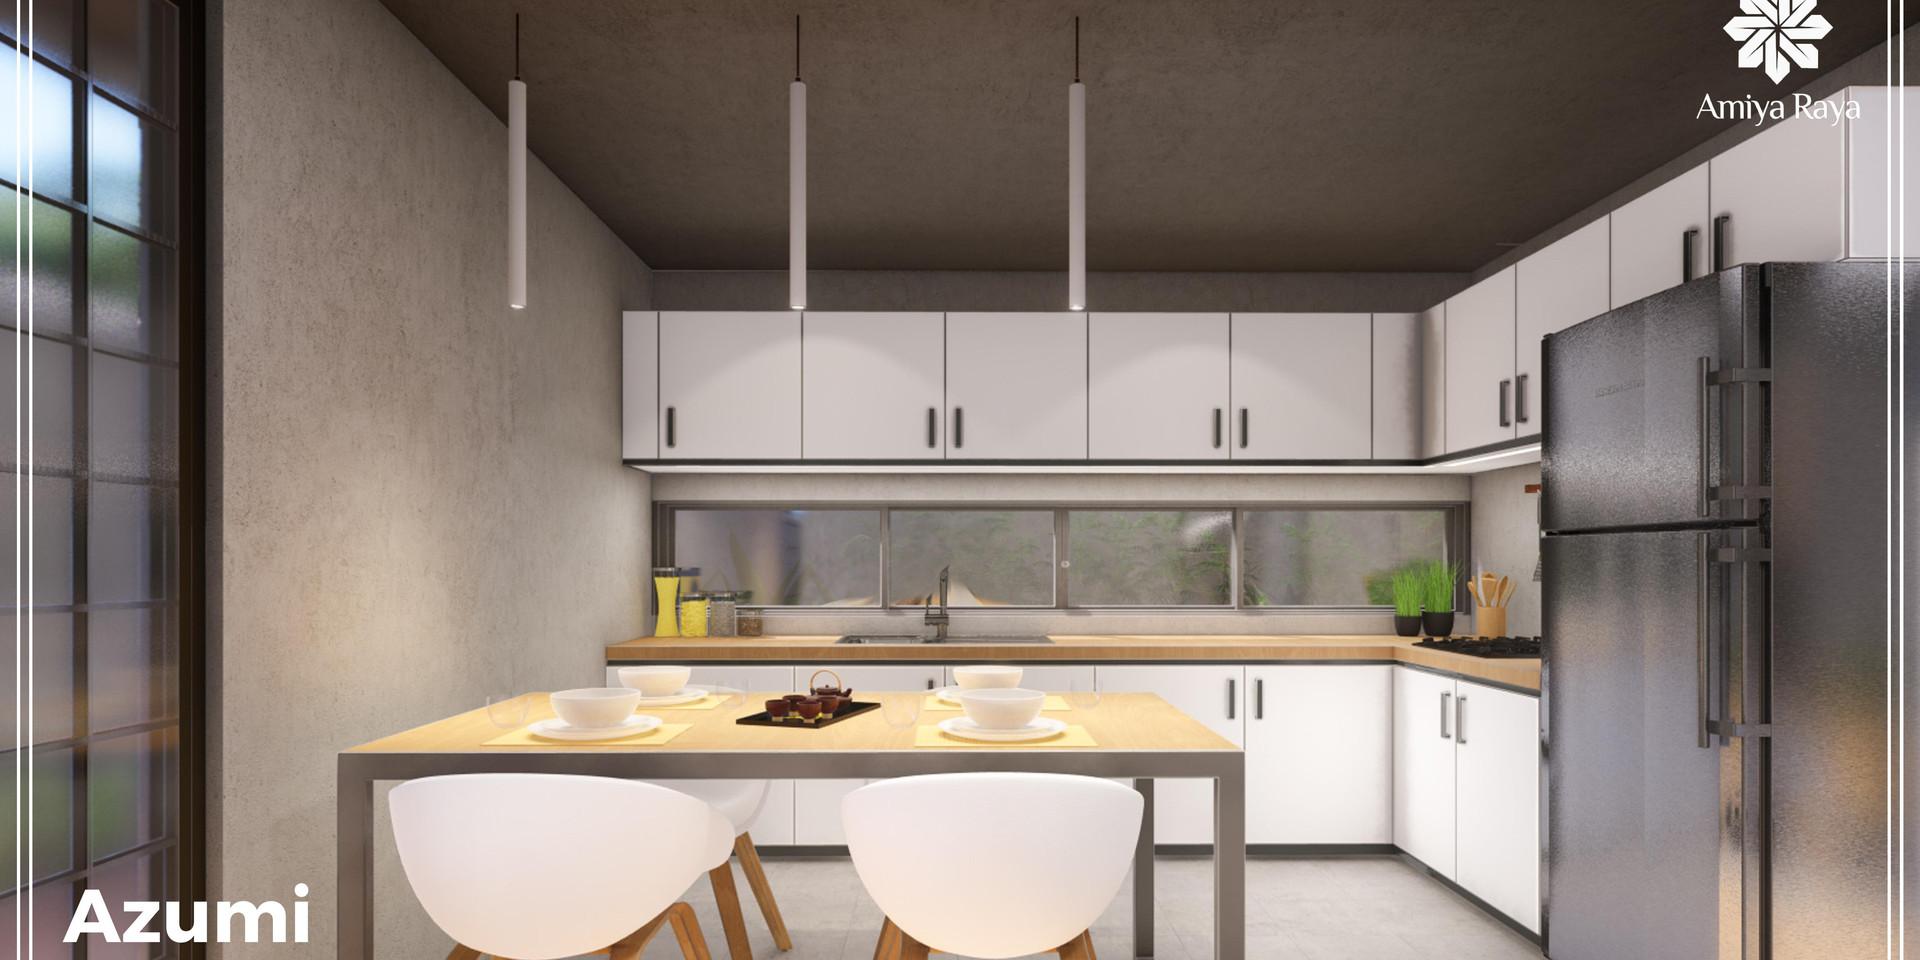 azumi-dining_kitchen.jpg